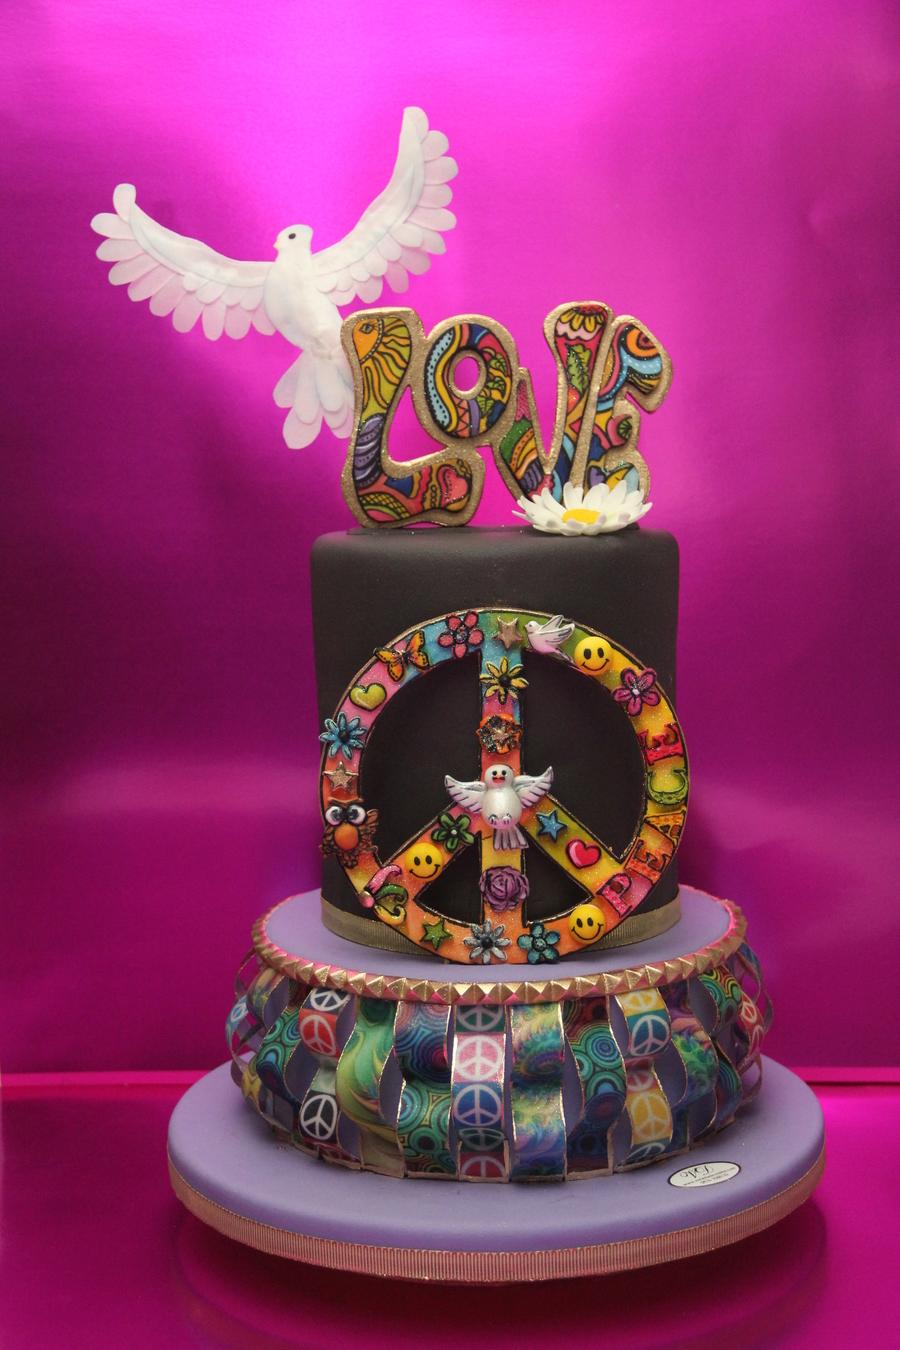 Retro Birthday Cake Word Love And Peace Symbol Made Of ...